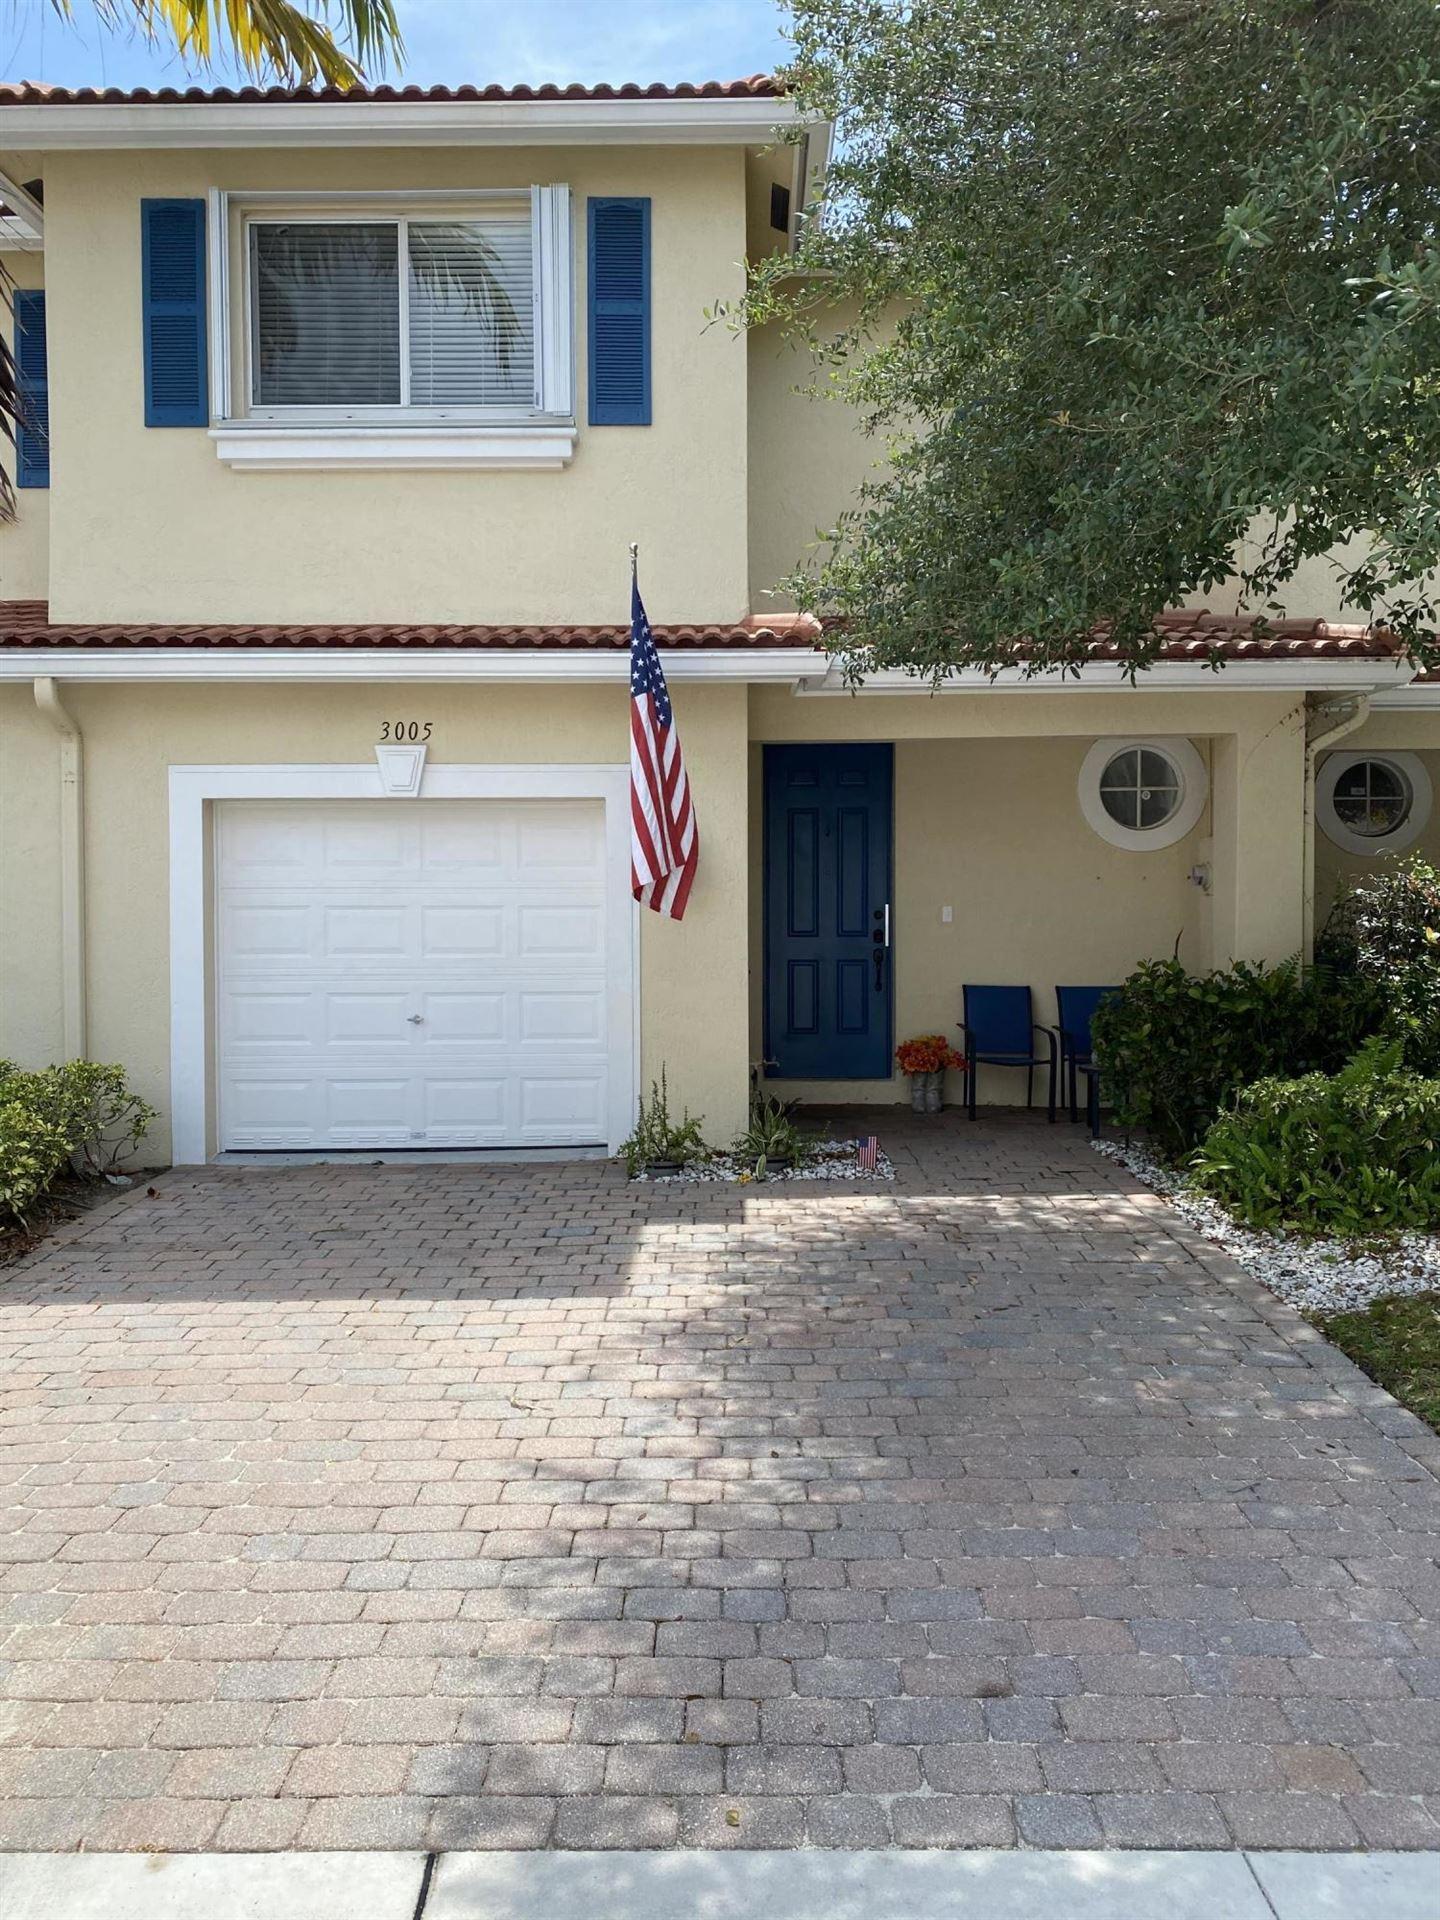 3005 N Evergreen Circle, Boynton Beach, FL 33426 - MLS#: RX-10714925